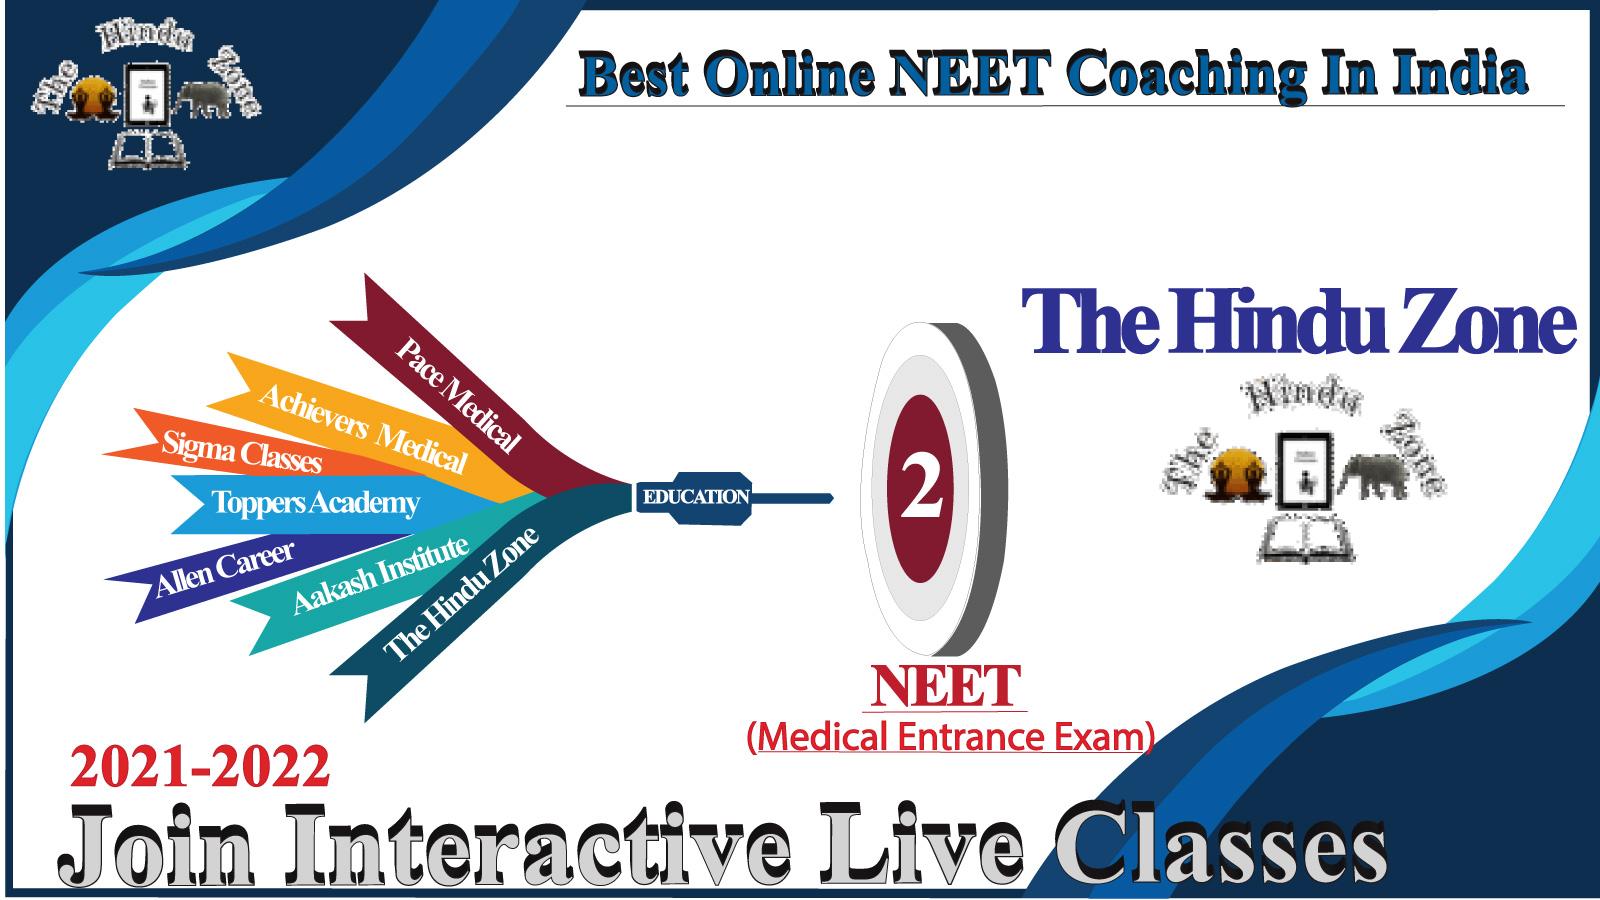 The hindu zone online coaching for neet